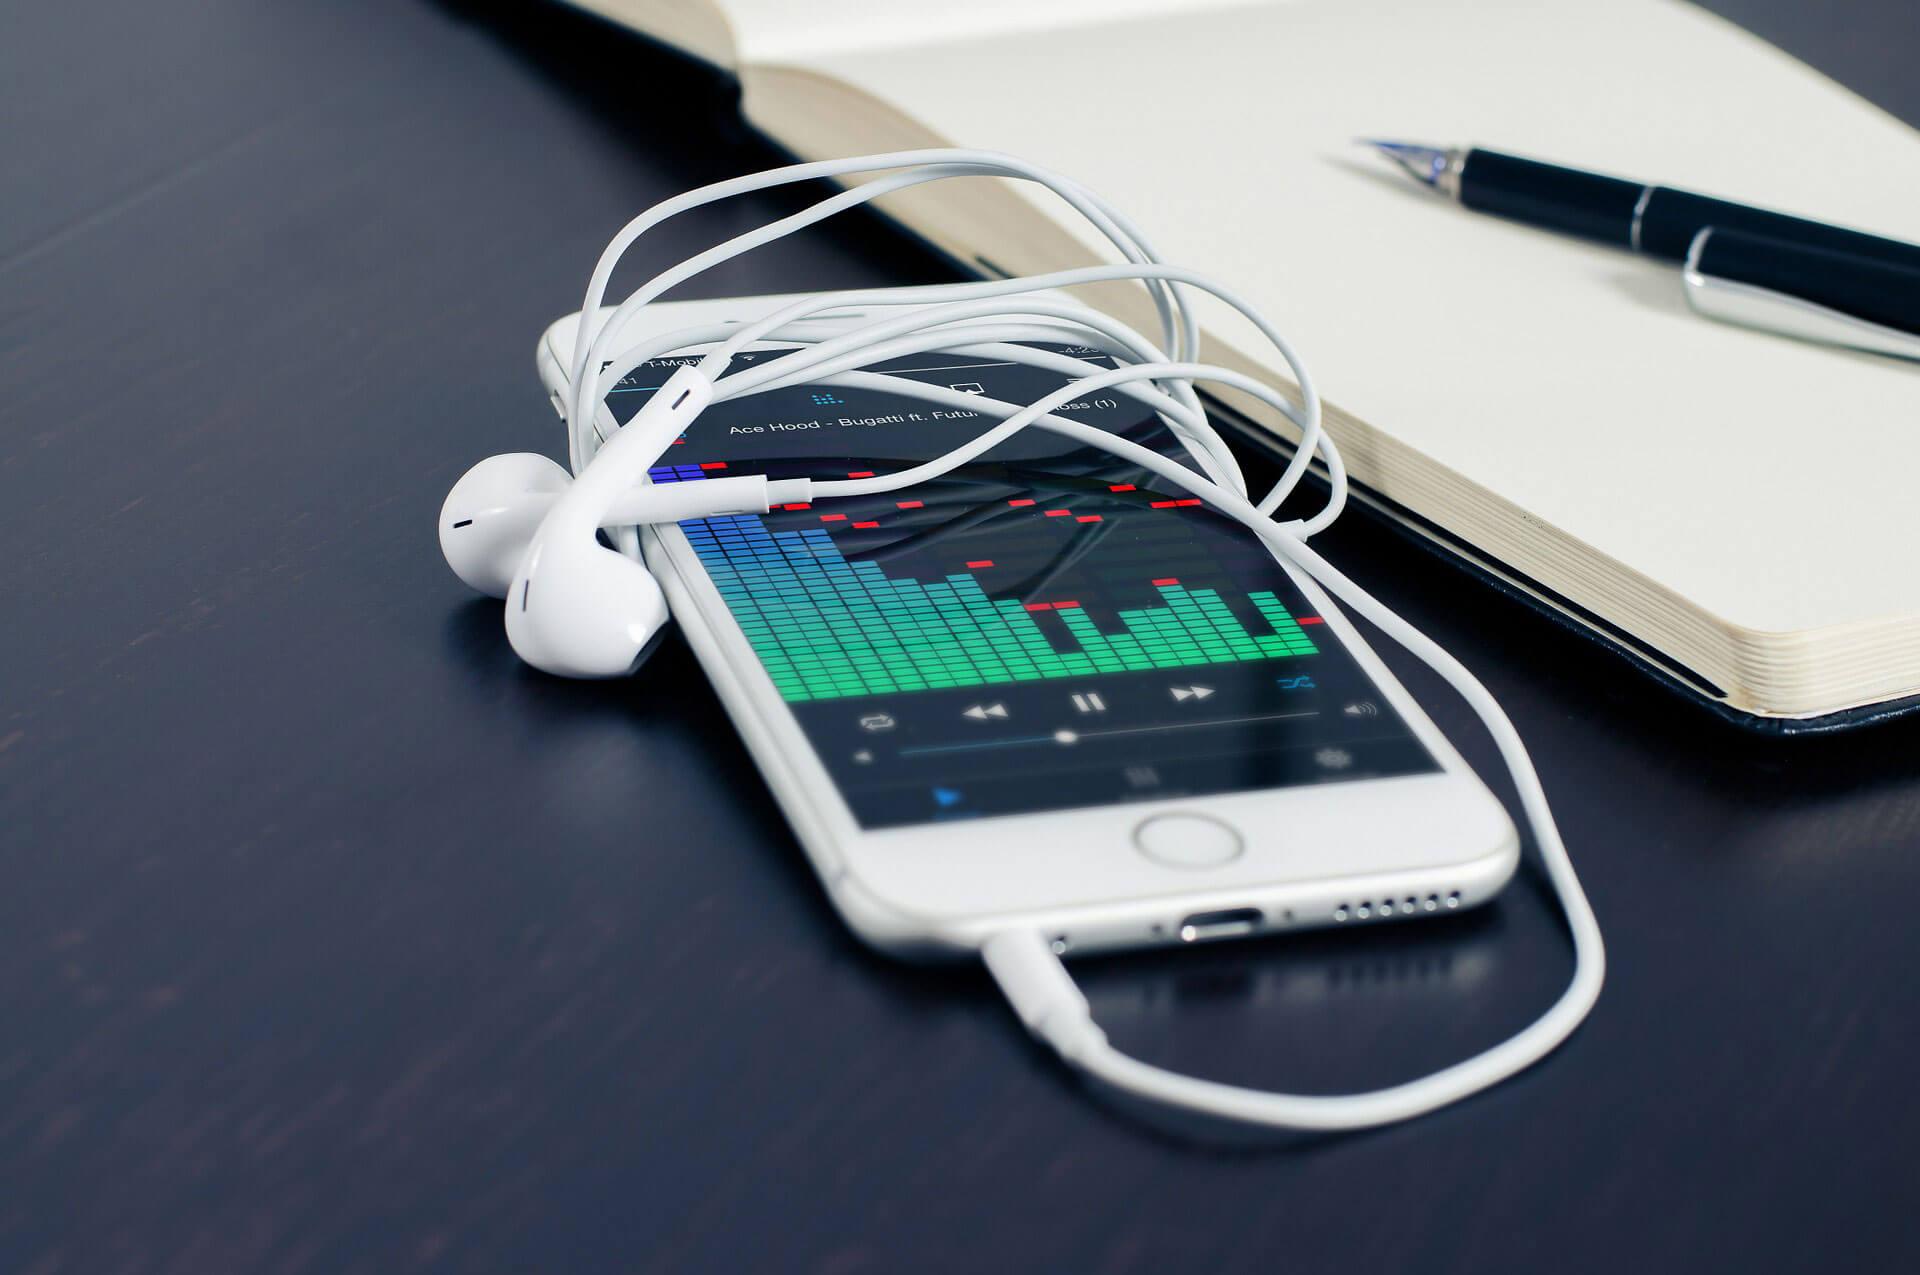 Smartphone mit Hifi-Qualität